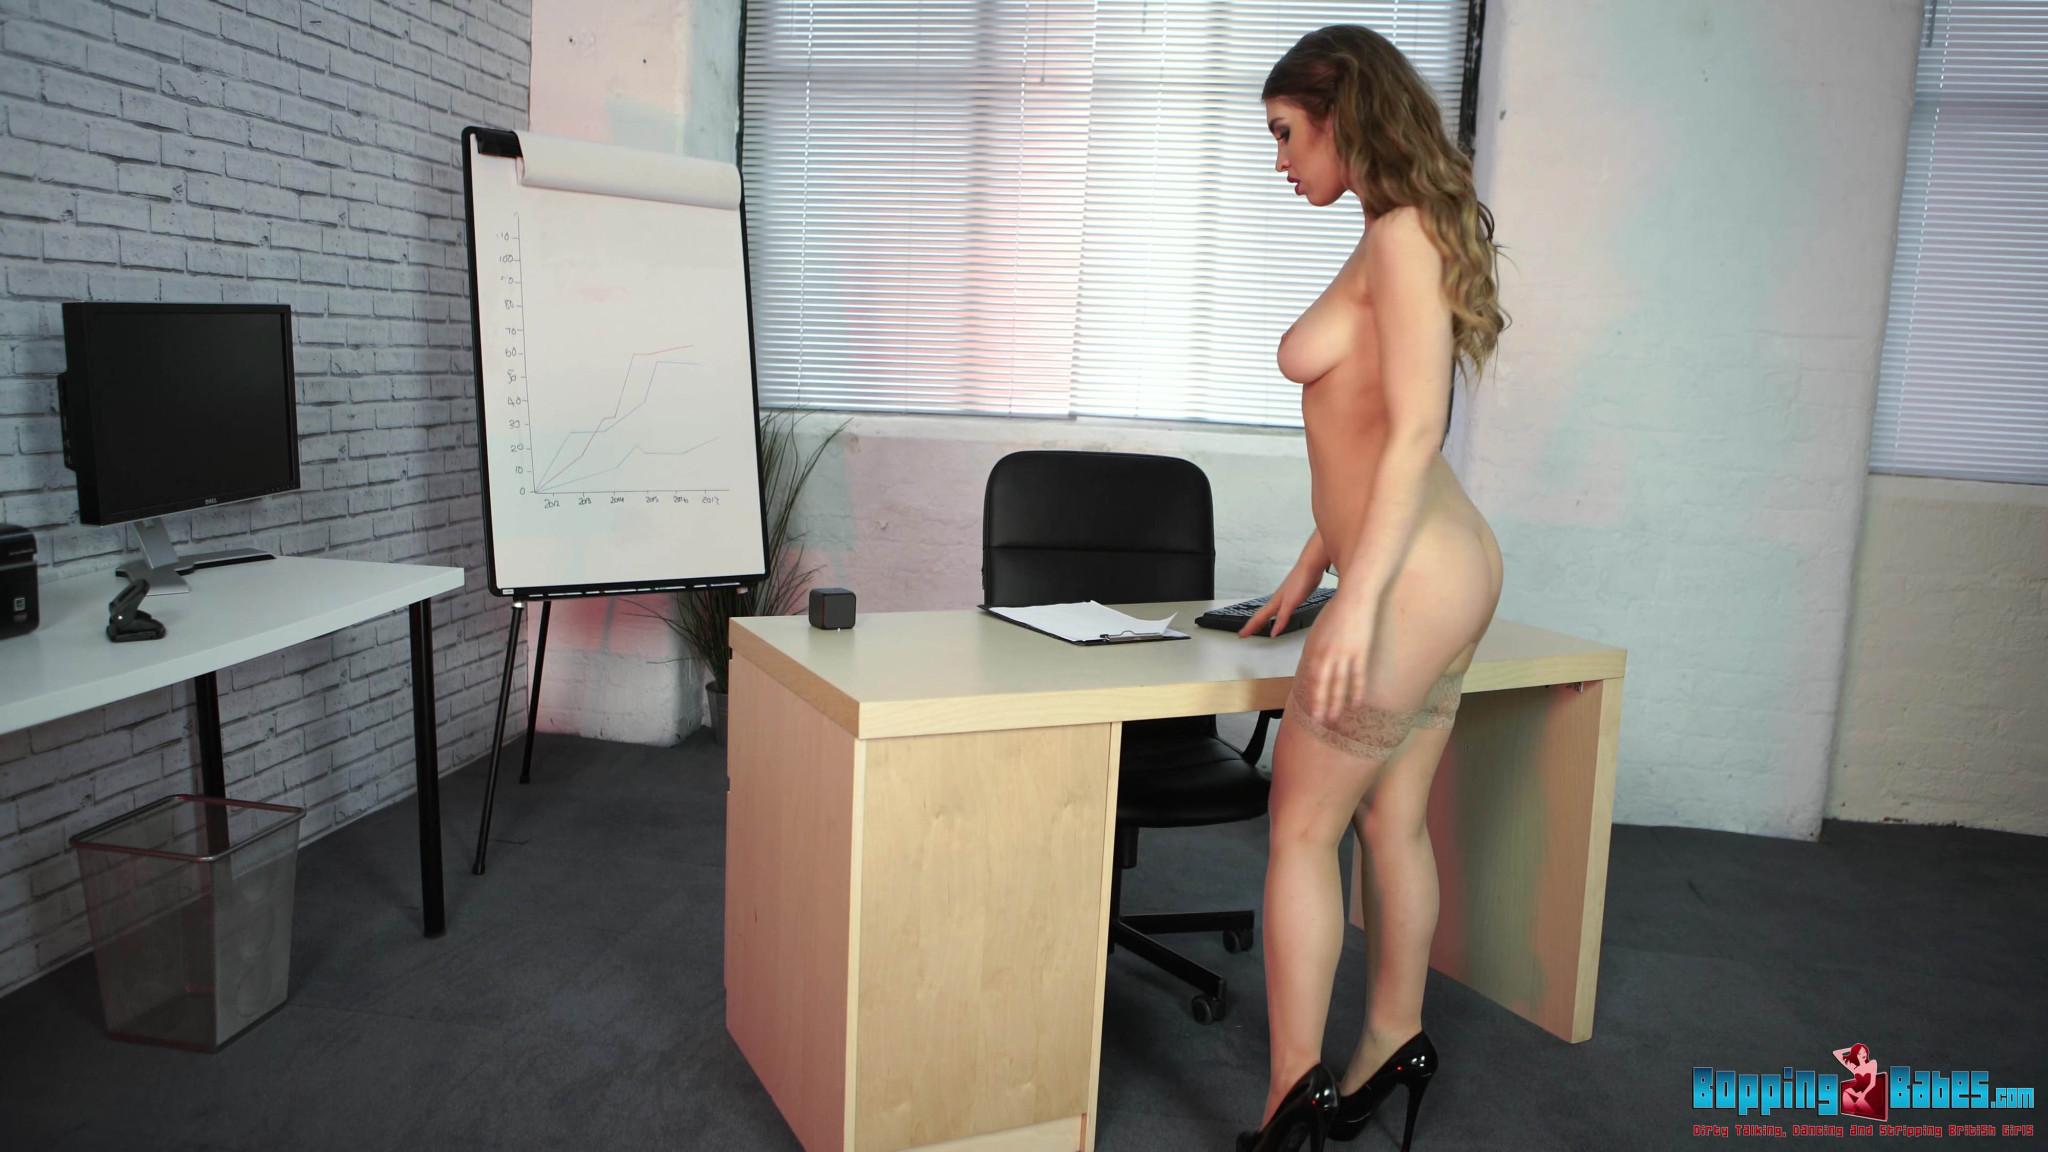 College dare nude striptease